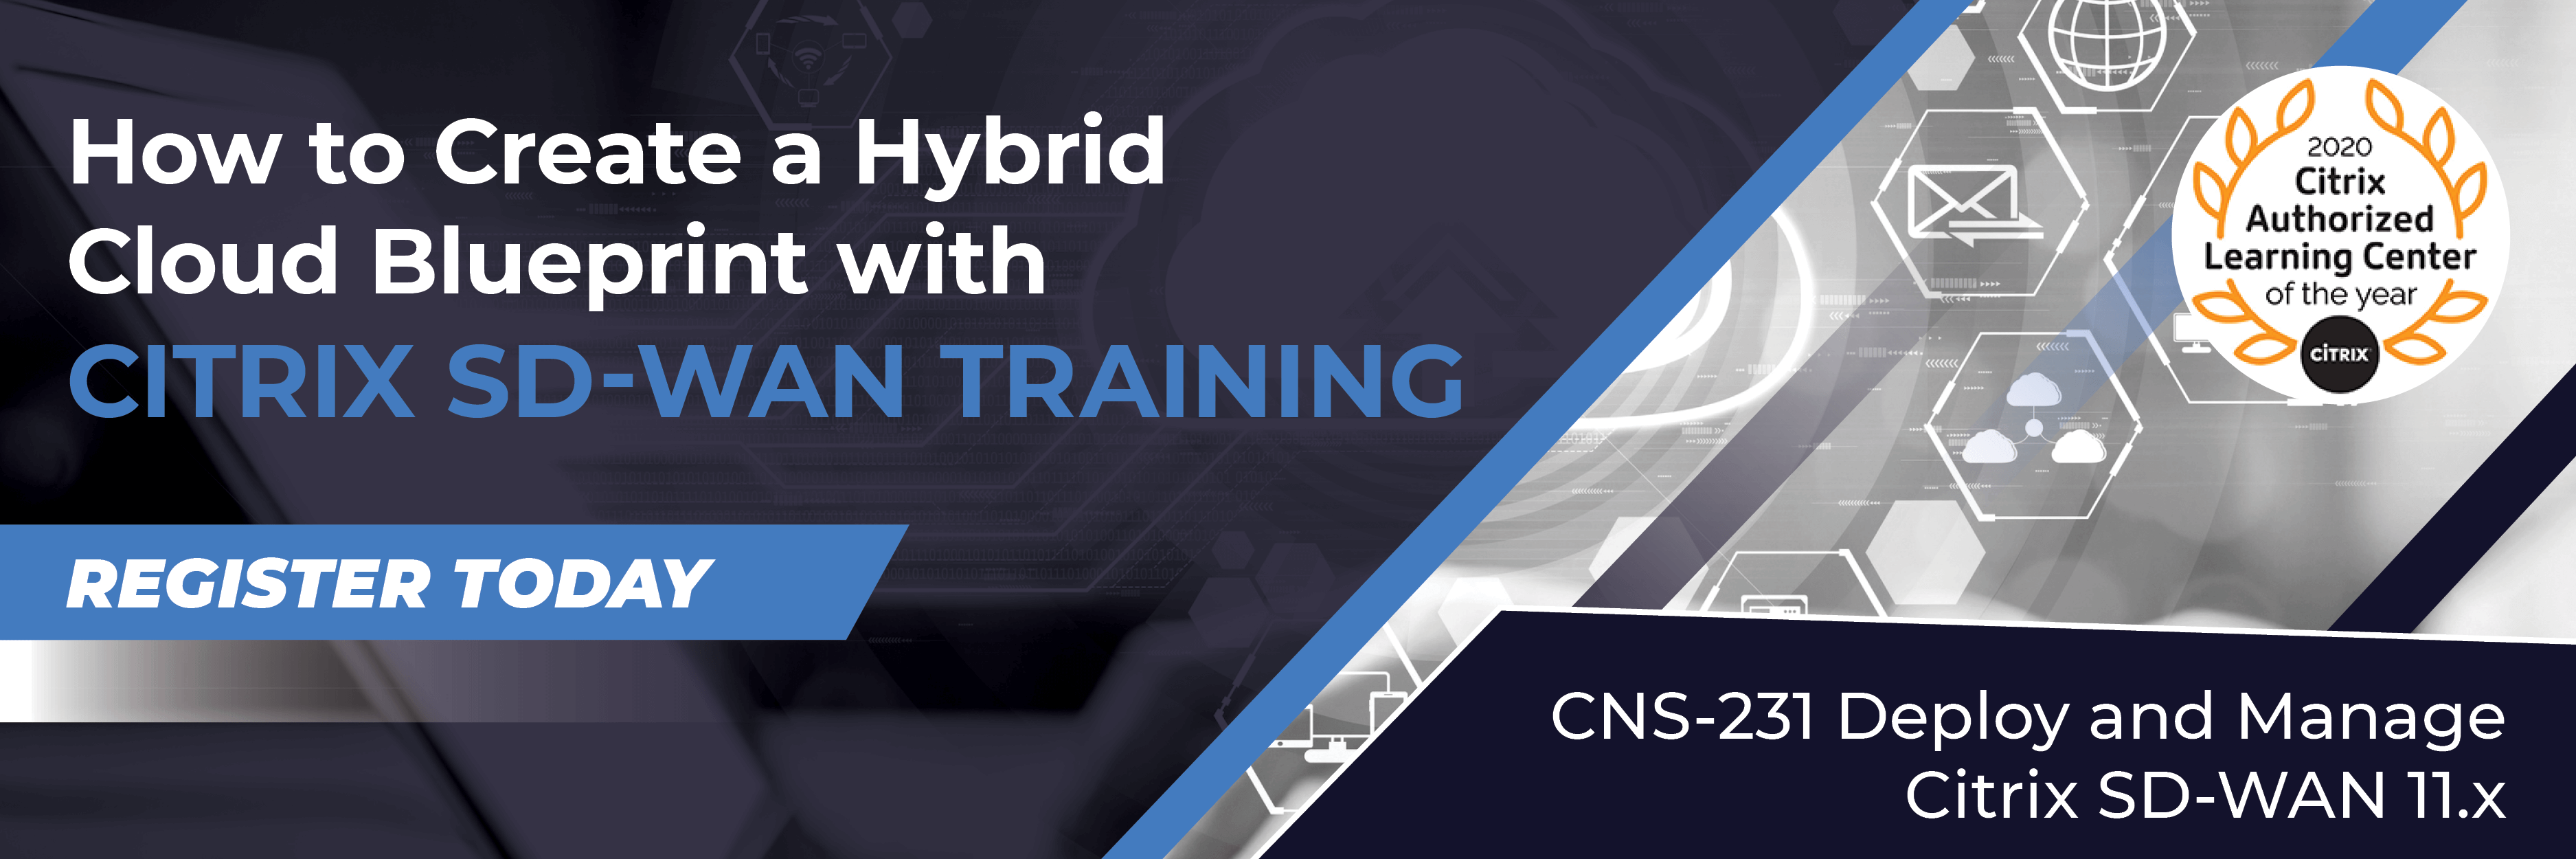 Create a Hybrid Cloud Blueprint with Citrix Training-SD-WAN